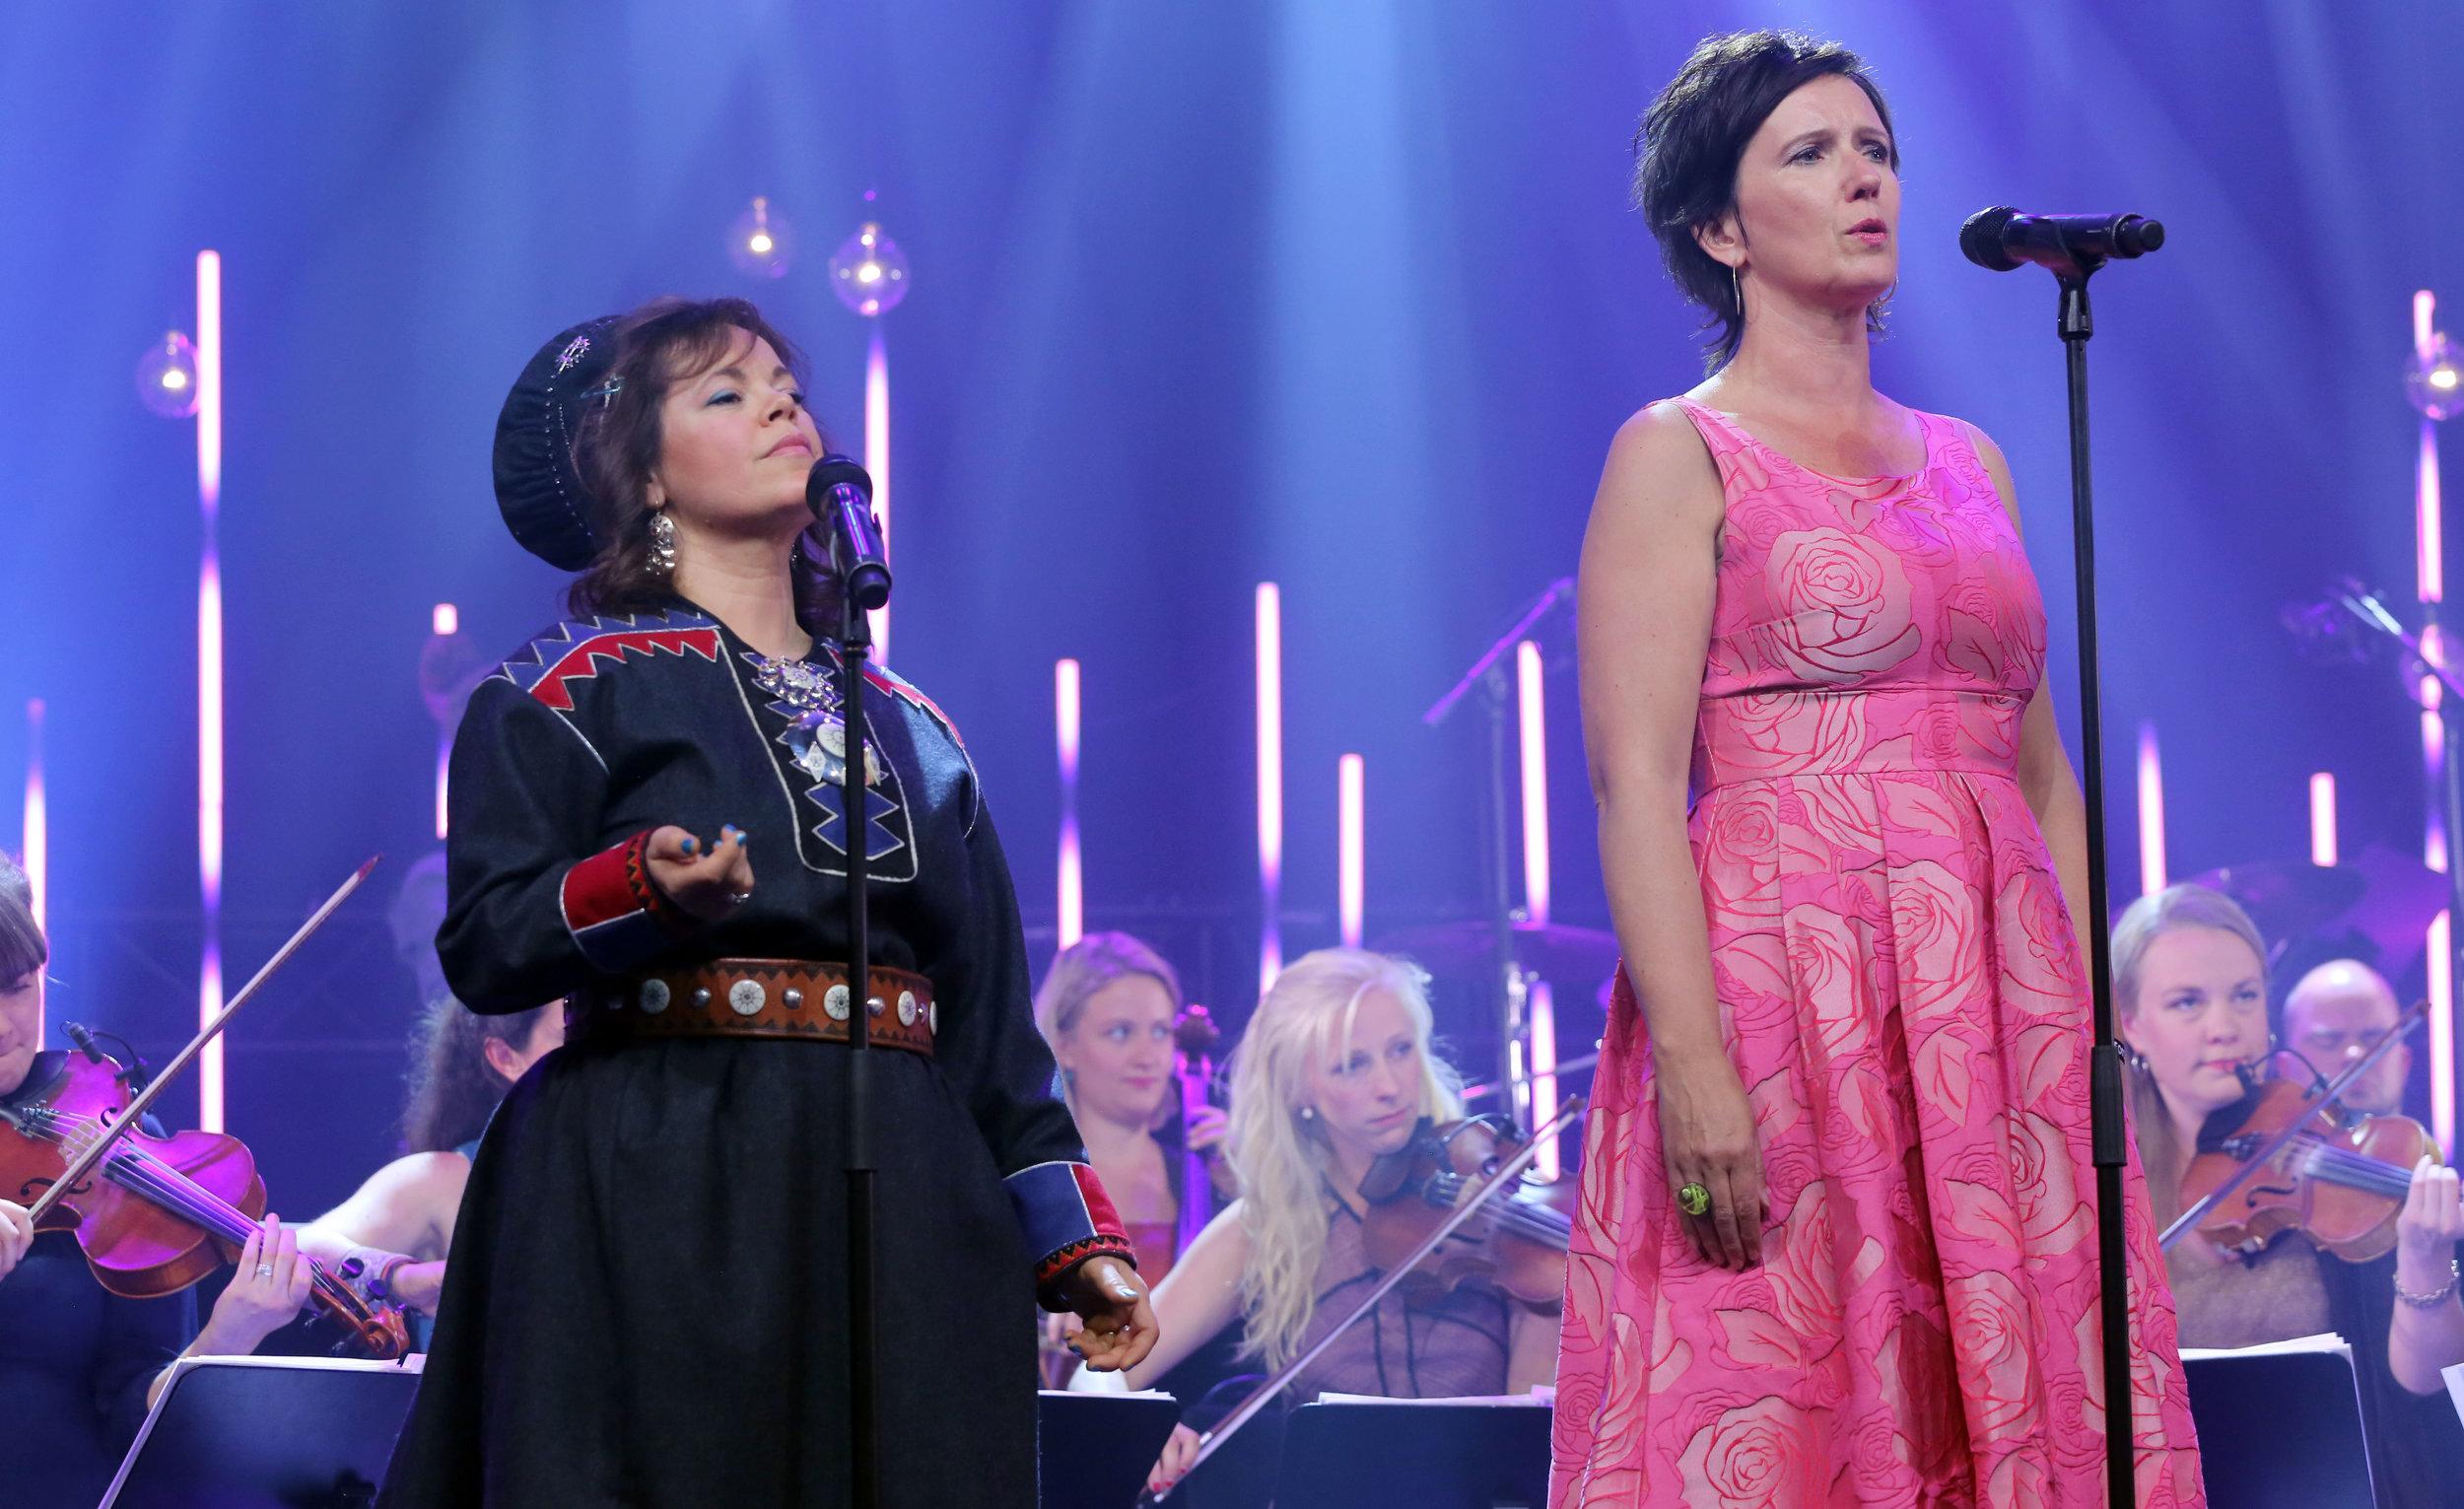 Ulla Pirttijärvi-Länsman and Berit Opheim